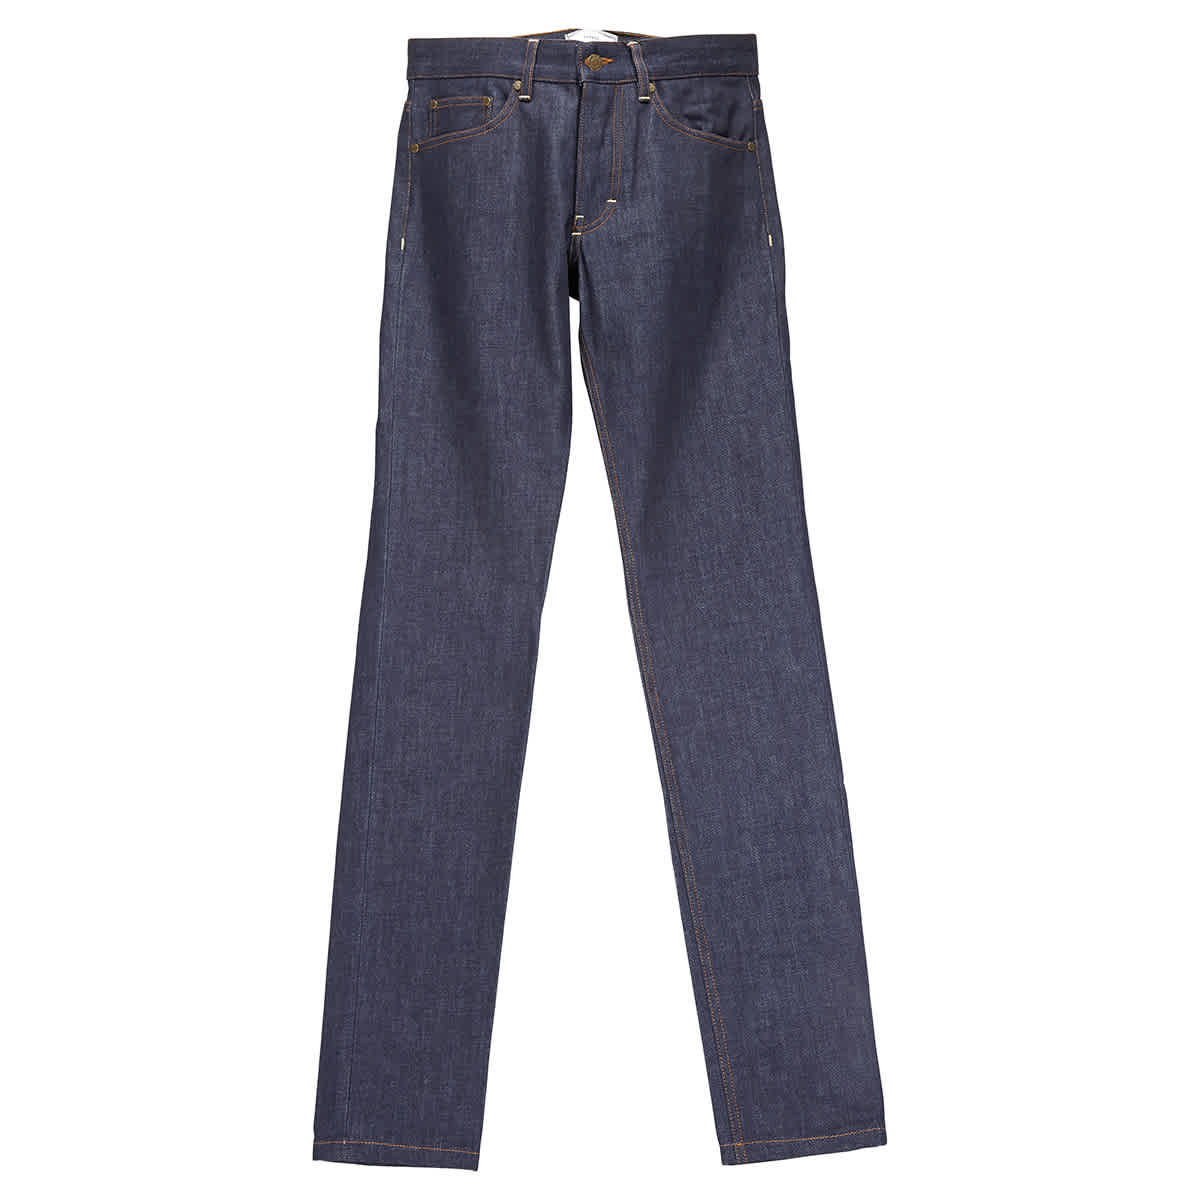 Ami Alexandre Mattiussi Mens Denim Straight Fit Jeans In Blue,yellow